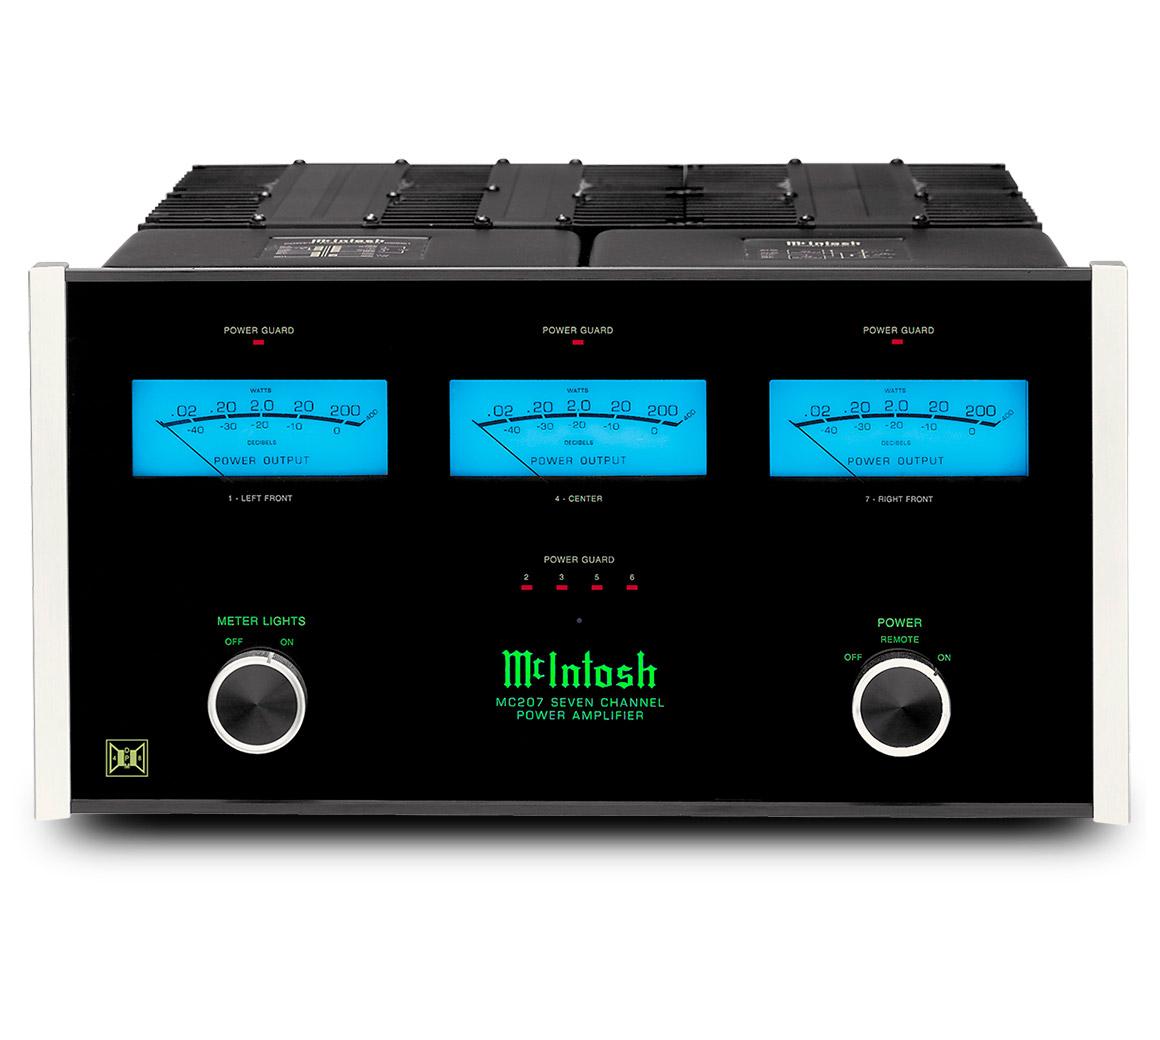 mcintosh mc207 home theater amplifier rh mcintoshlabs com